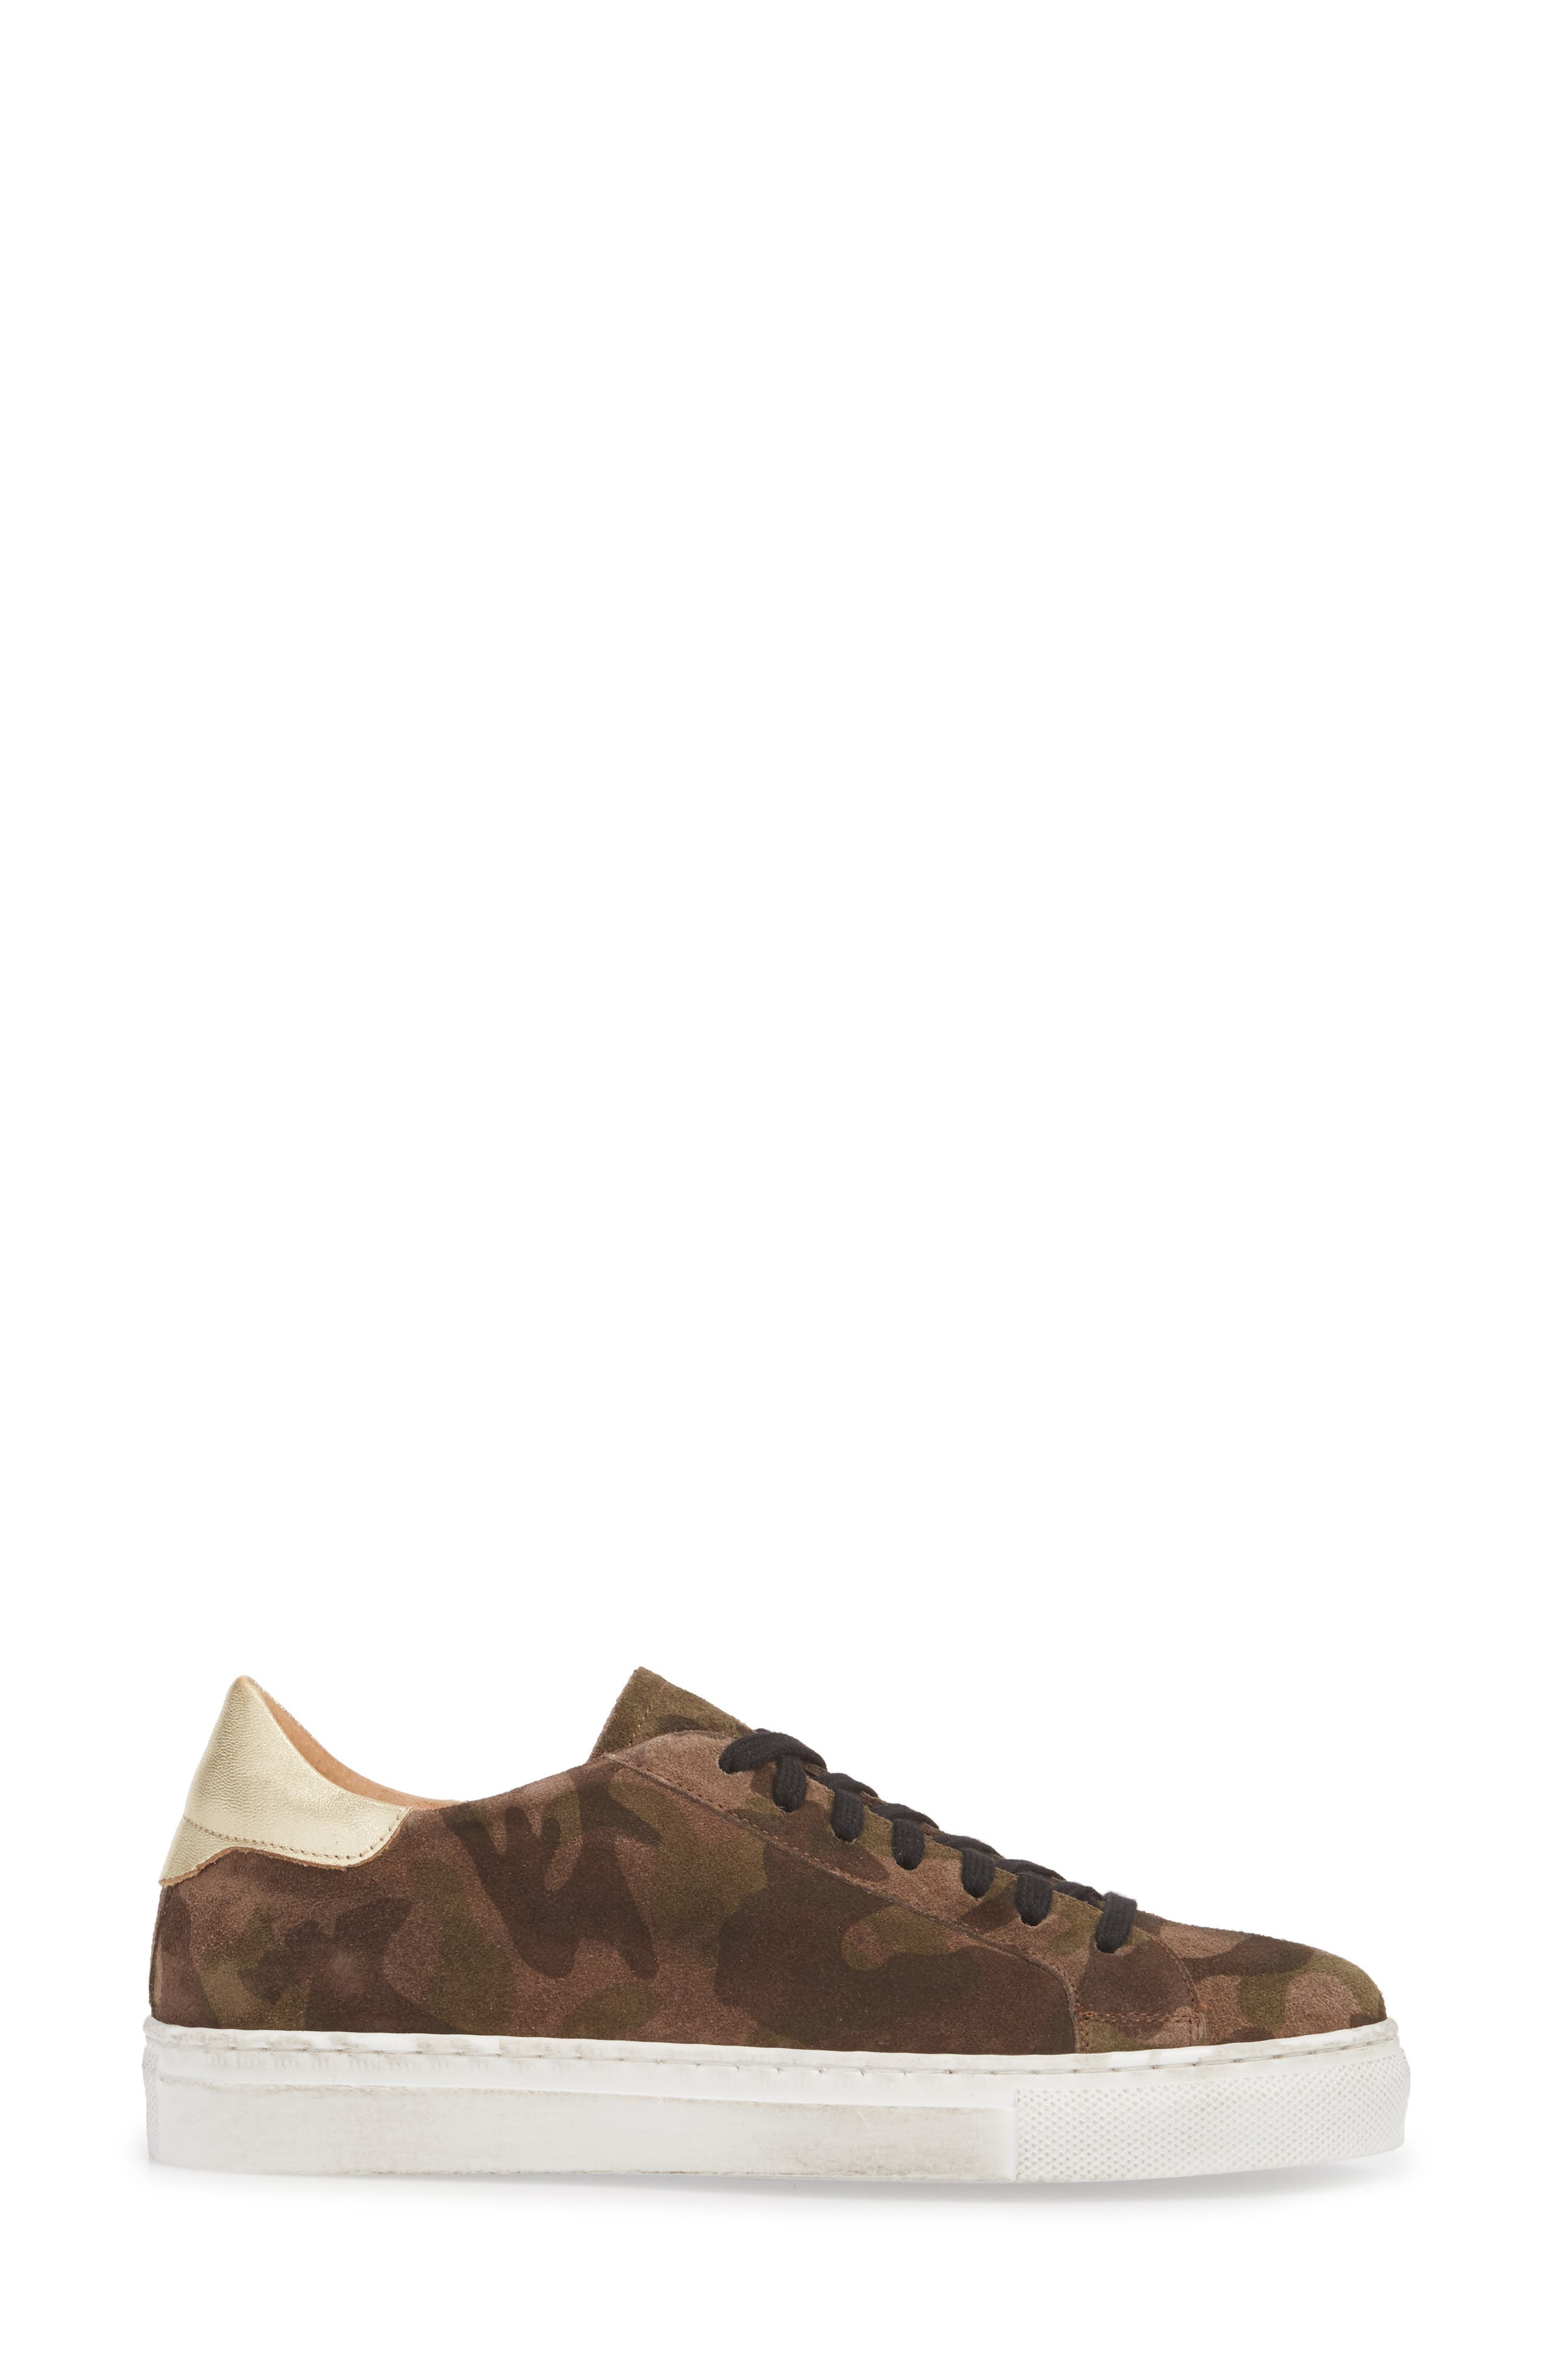 Orissa Sneaker,                             Alternate thumbnail 3, color,                             MILITARY PRINT SUEDE